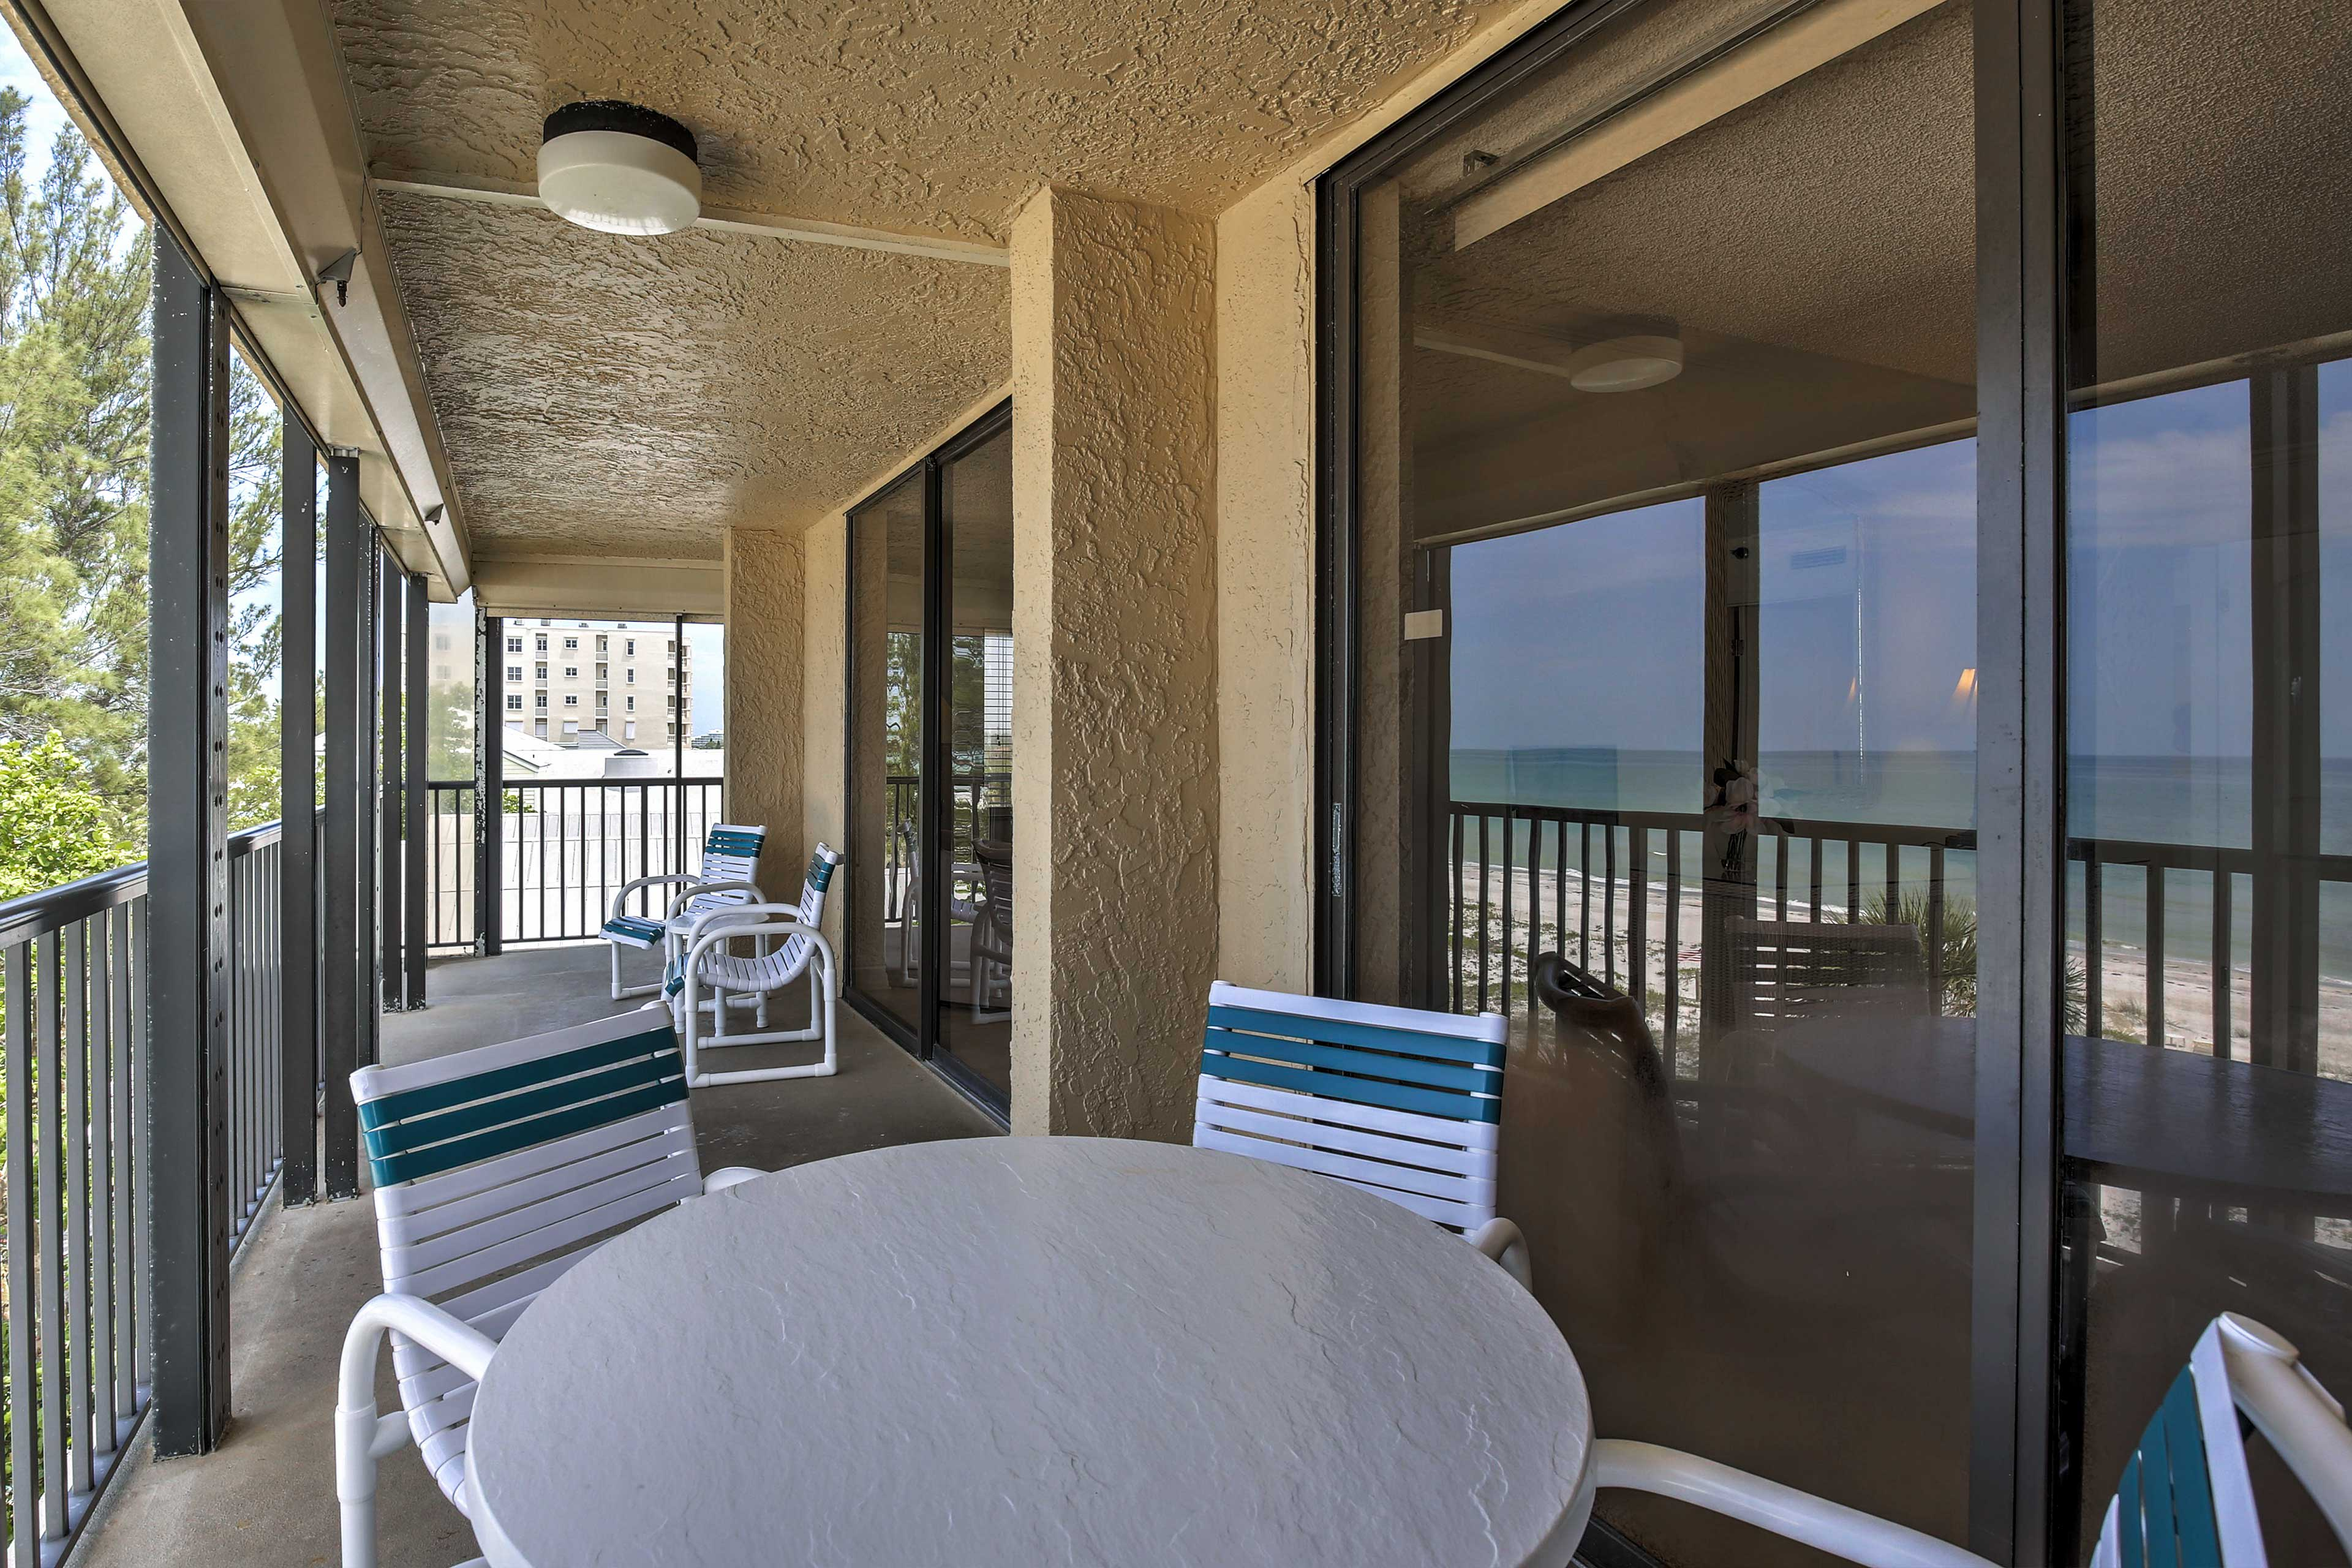 Dine al fresco on the furnished balcony.